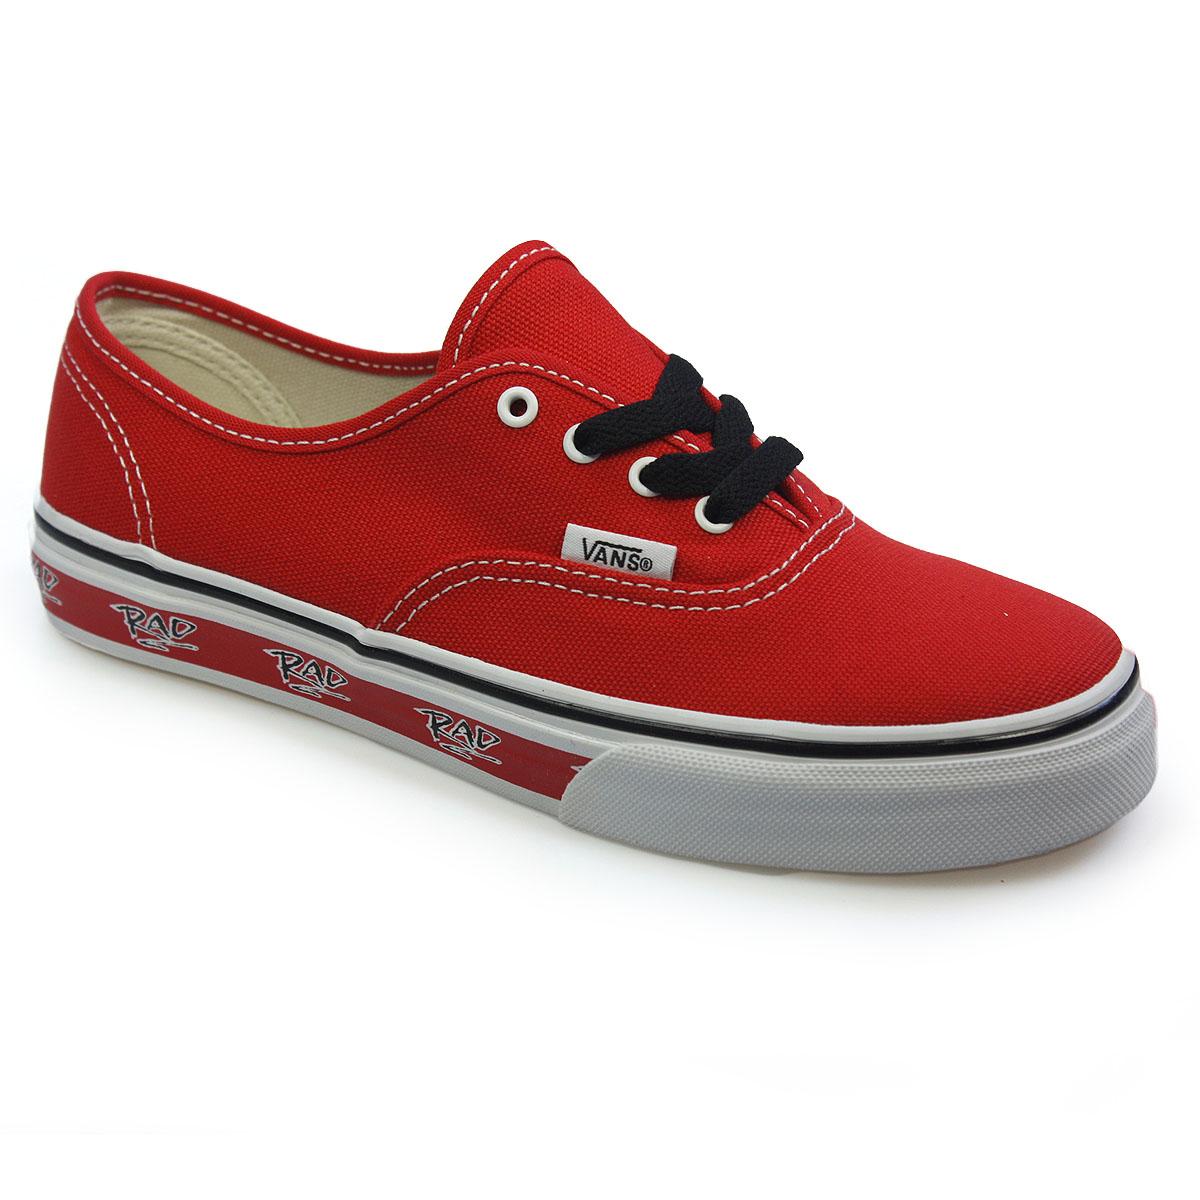 Vans-Authentic-Kids-Red-